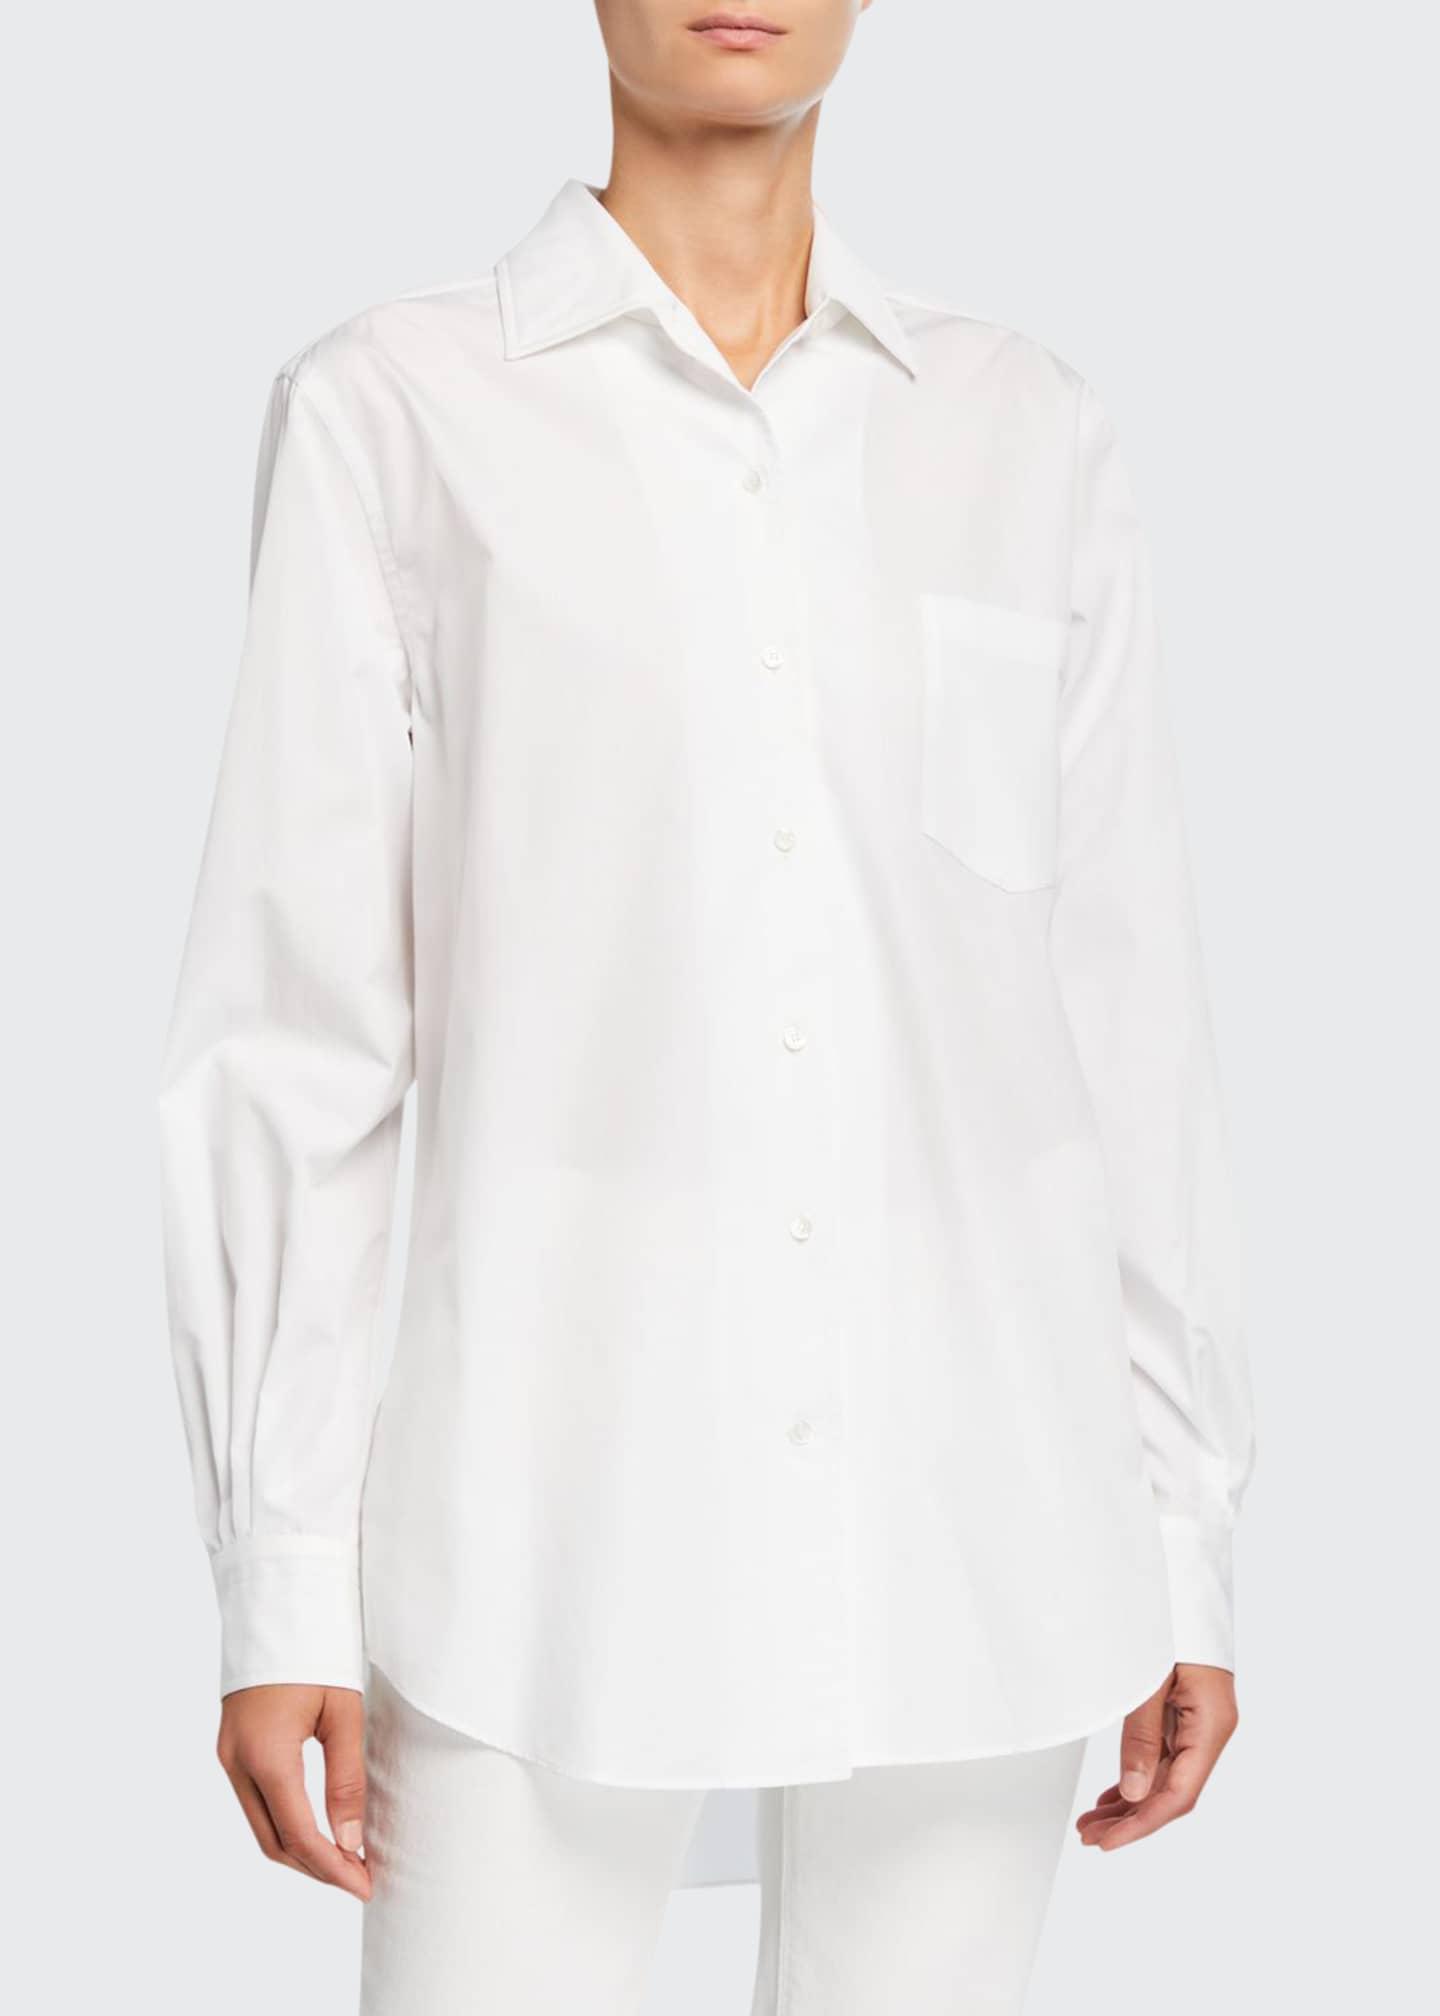 Loro Piana Oversized Poplin Button-Front Shirt